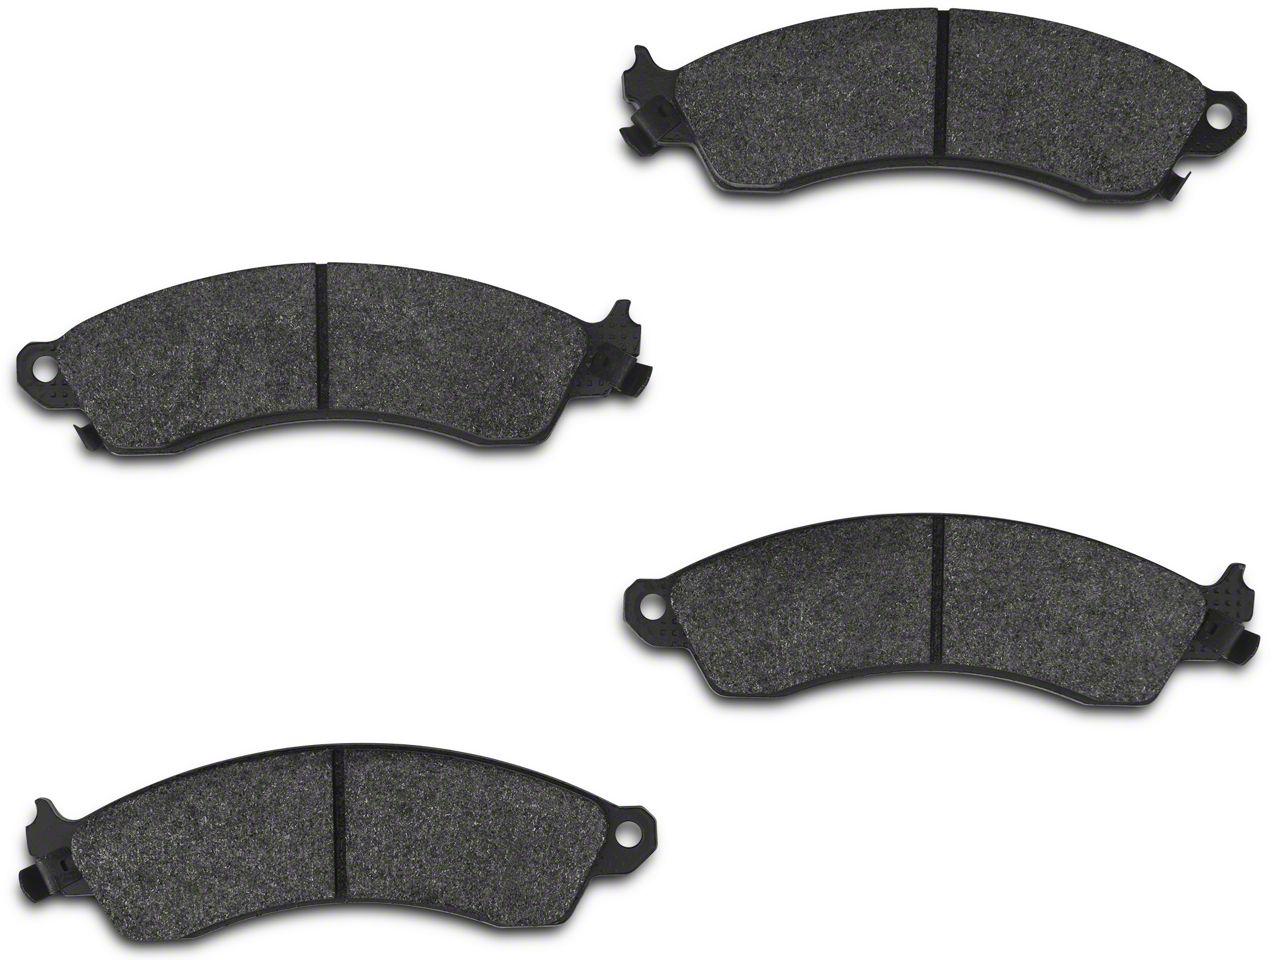 Xtreme Stop Performance Ceramic Brake Pads - Front Pair (94-04 Cobra, Bullitt, Mach 1)